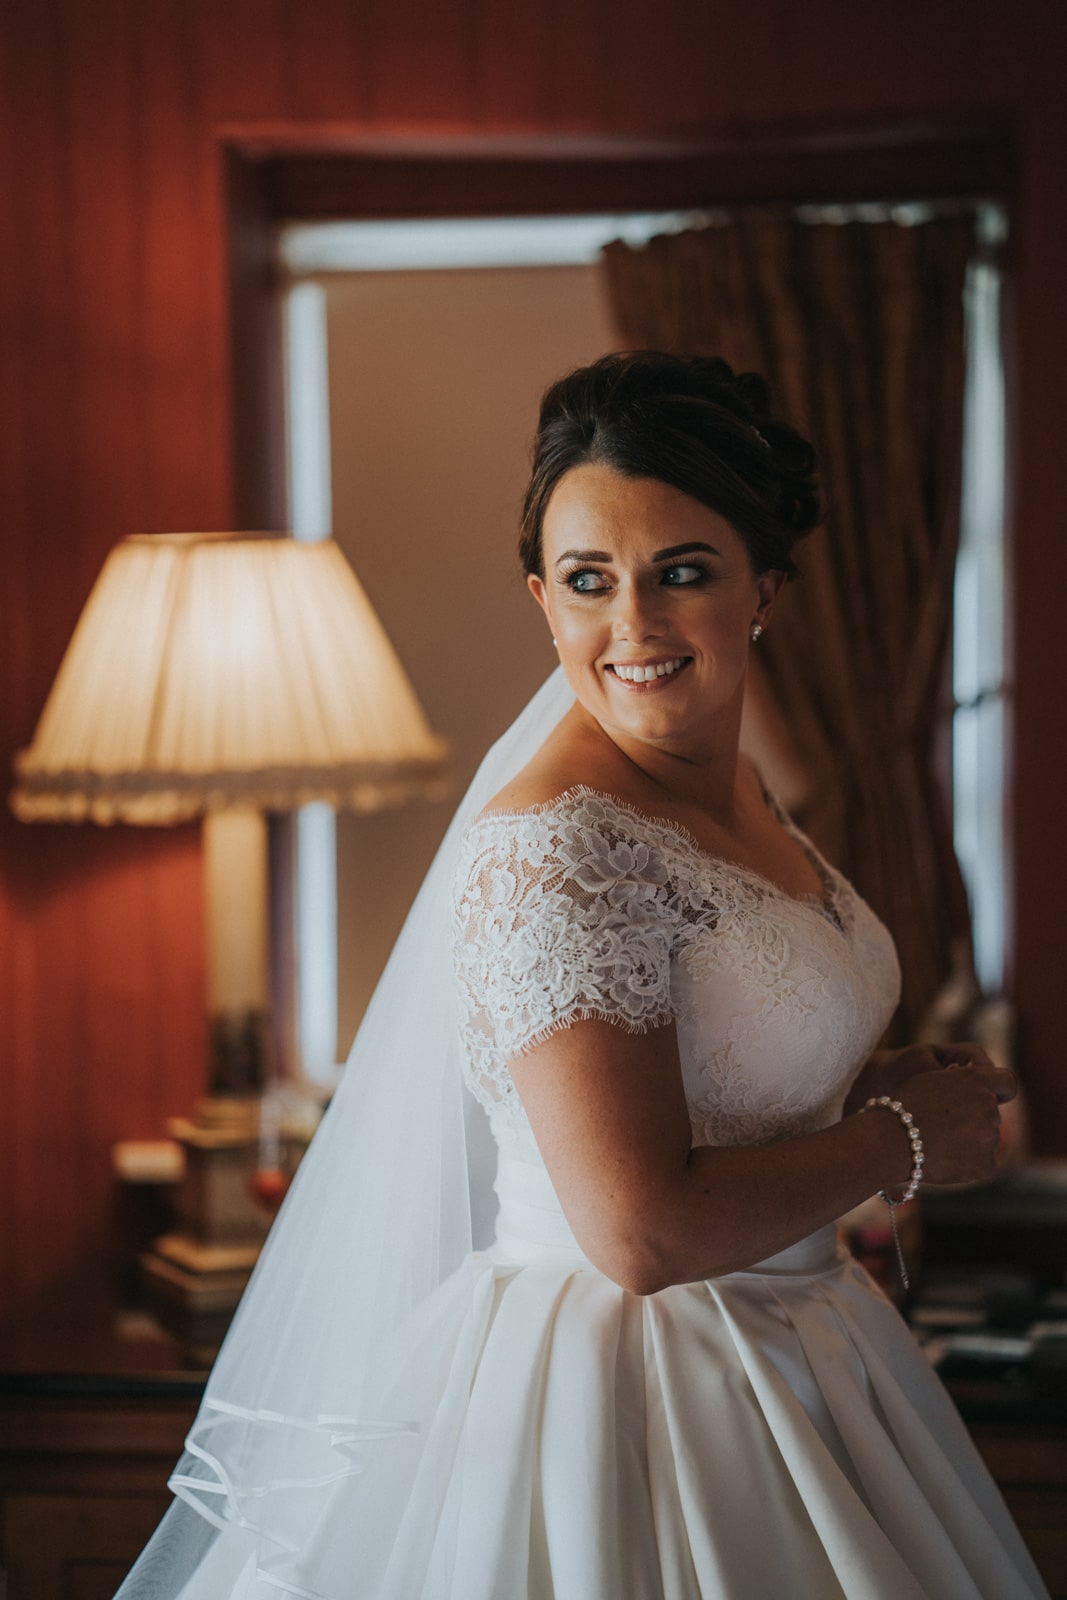 Dalmeny-Park-Glasgow-Wedding-Dearly-Photography-Scotland (8 of 75).jpg